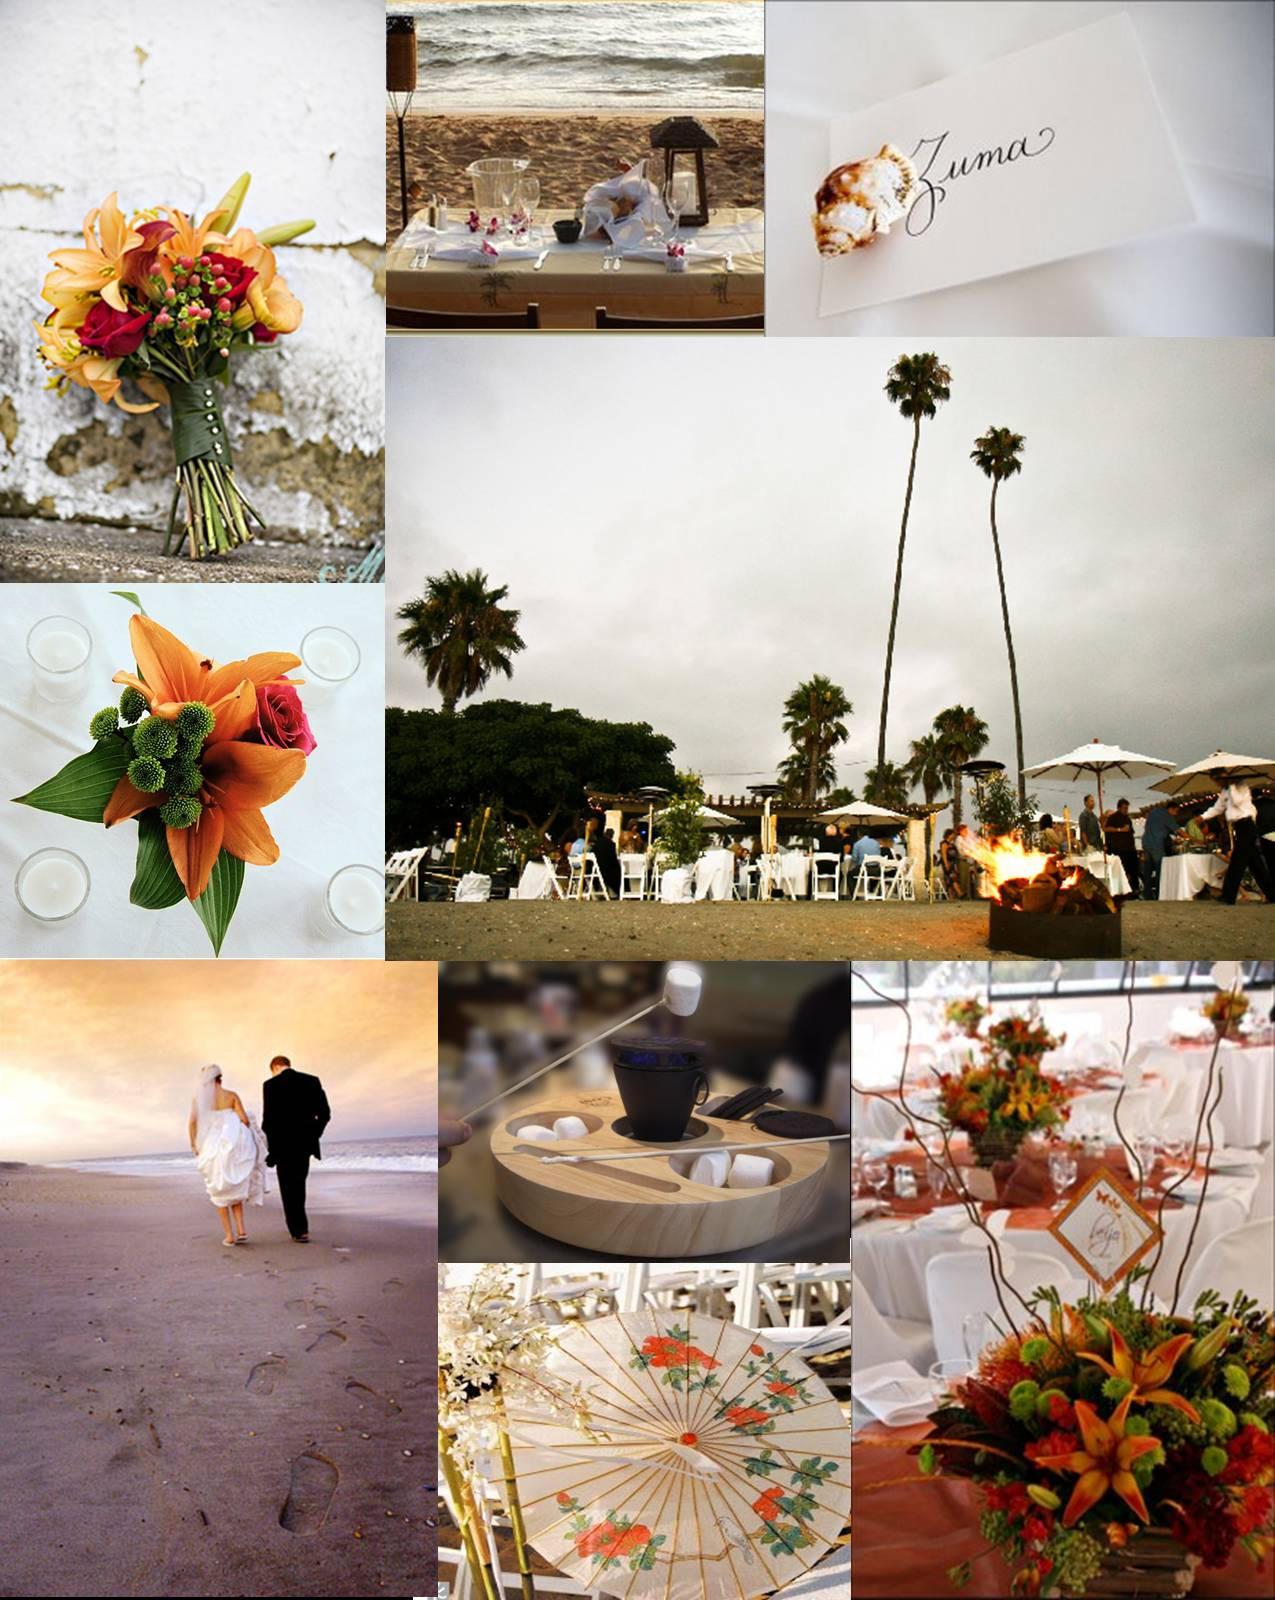 bonfire on the beach wedding inspiration board